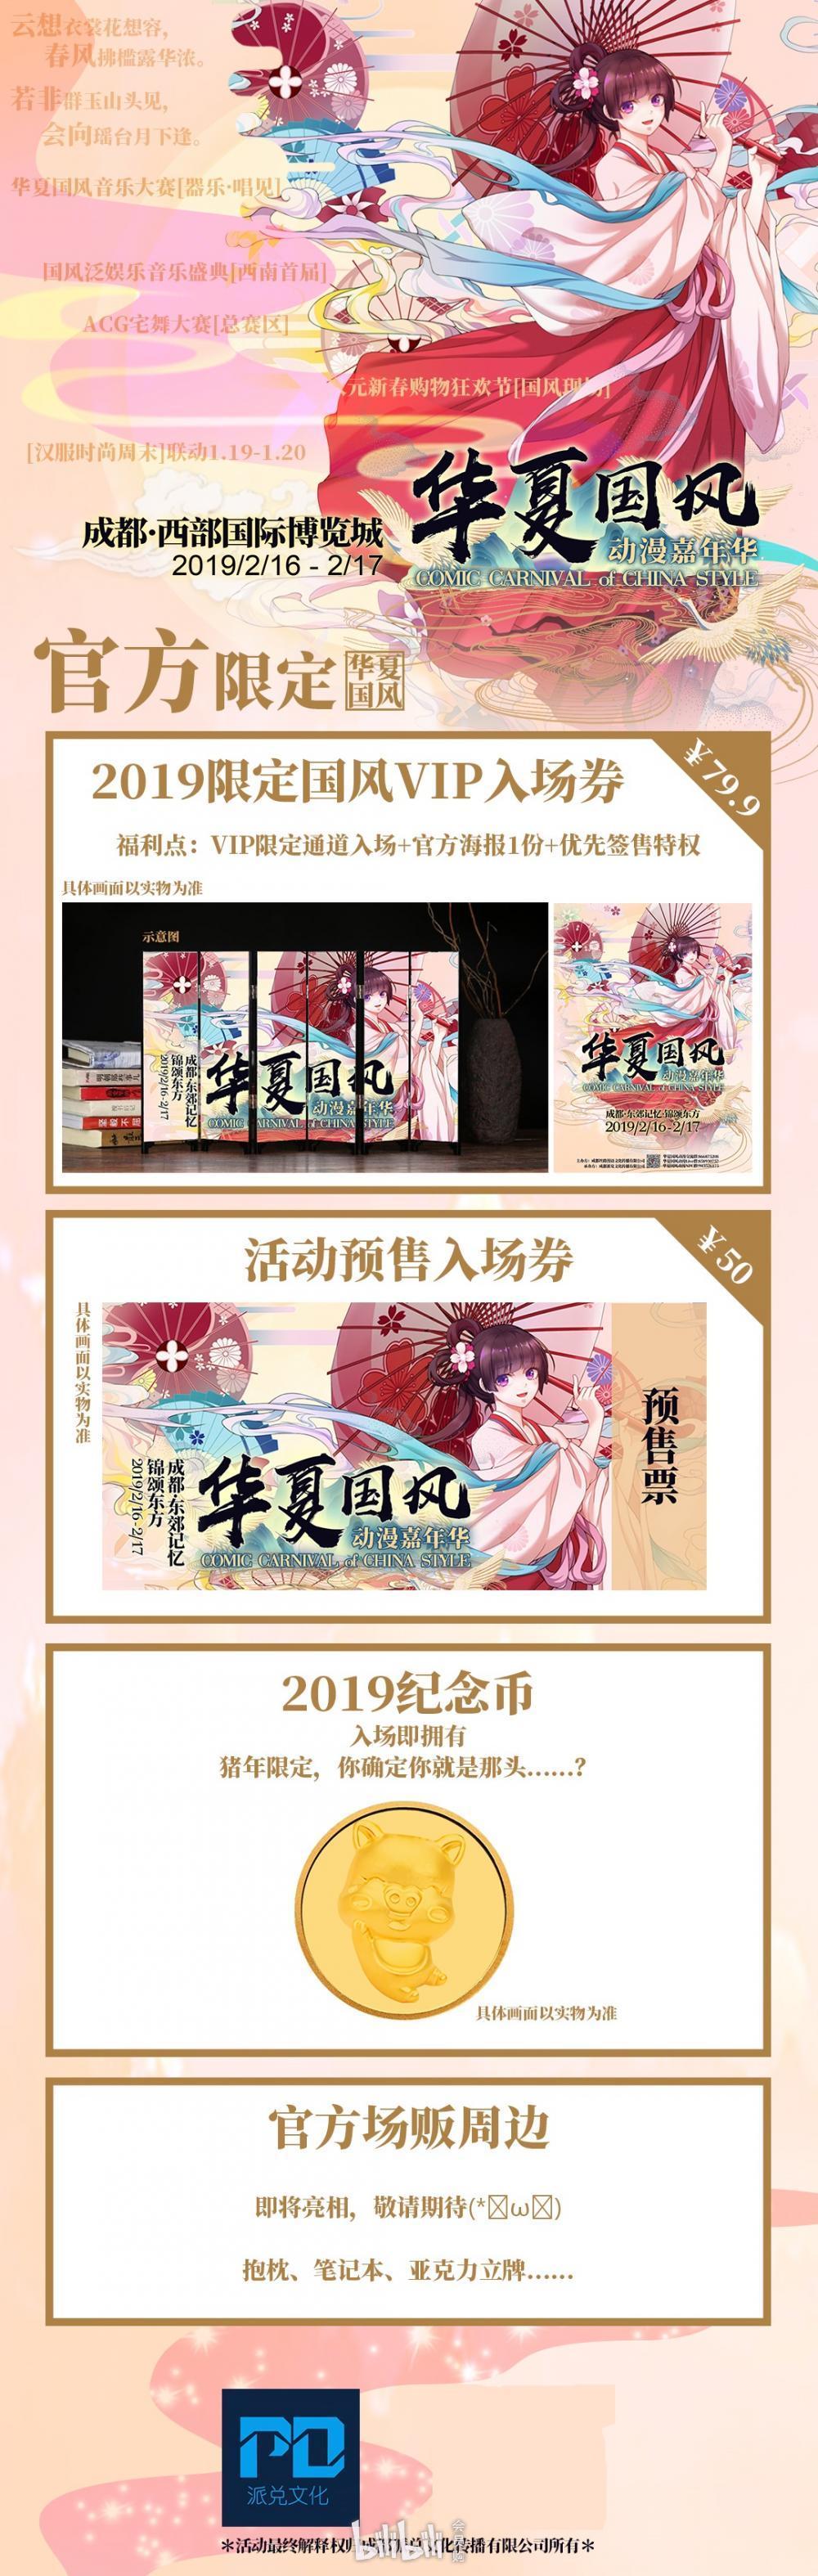 2019年成都华夏国风动漫嘉年华